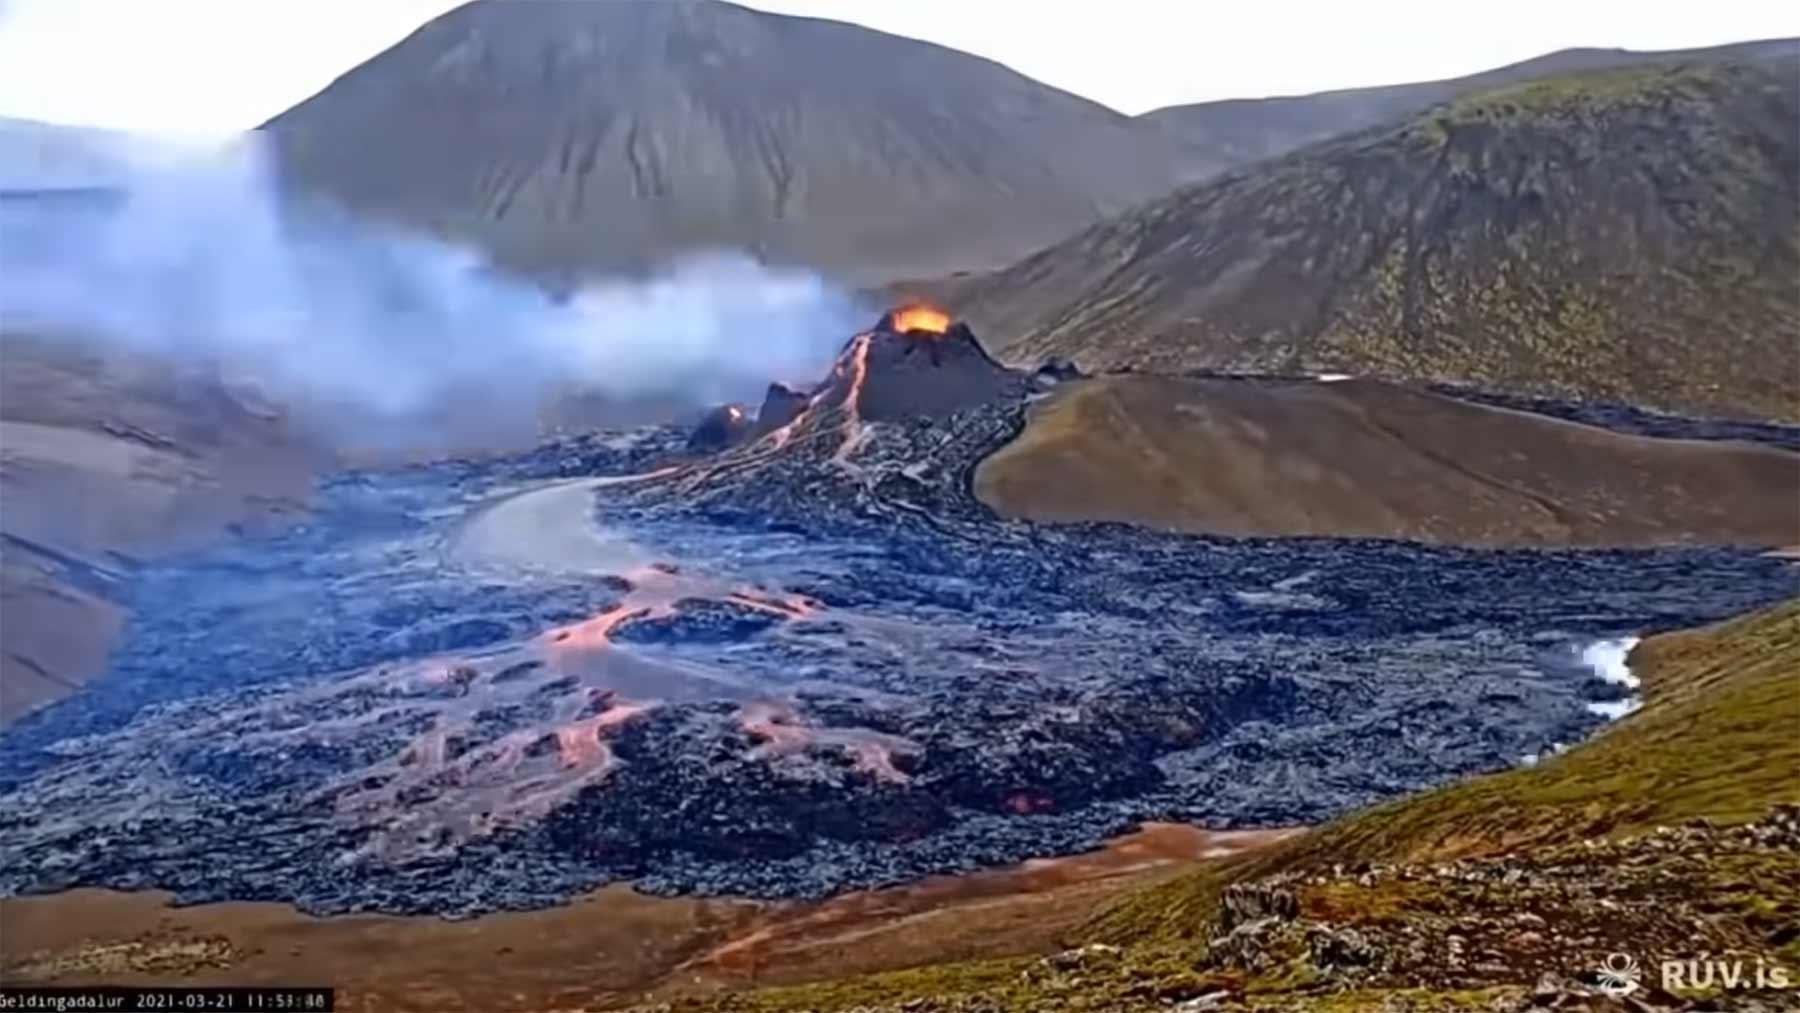 Vulkan-Timelapse: 18 Tage Fagradalsfjall in 5 Minuten